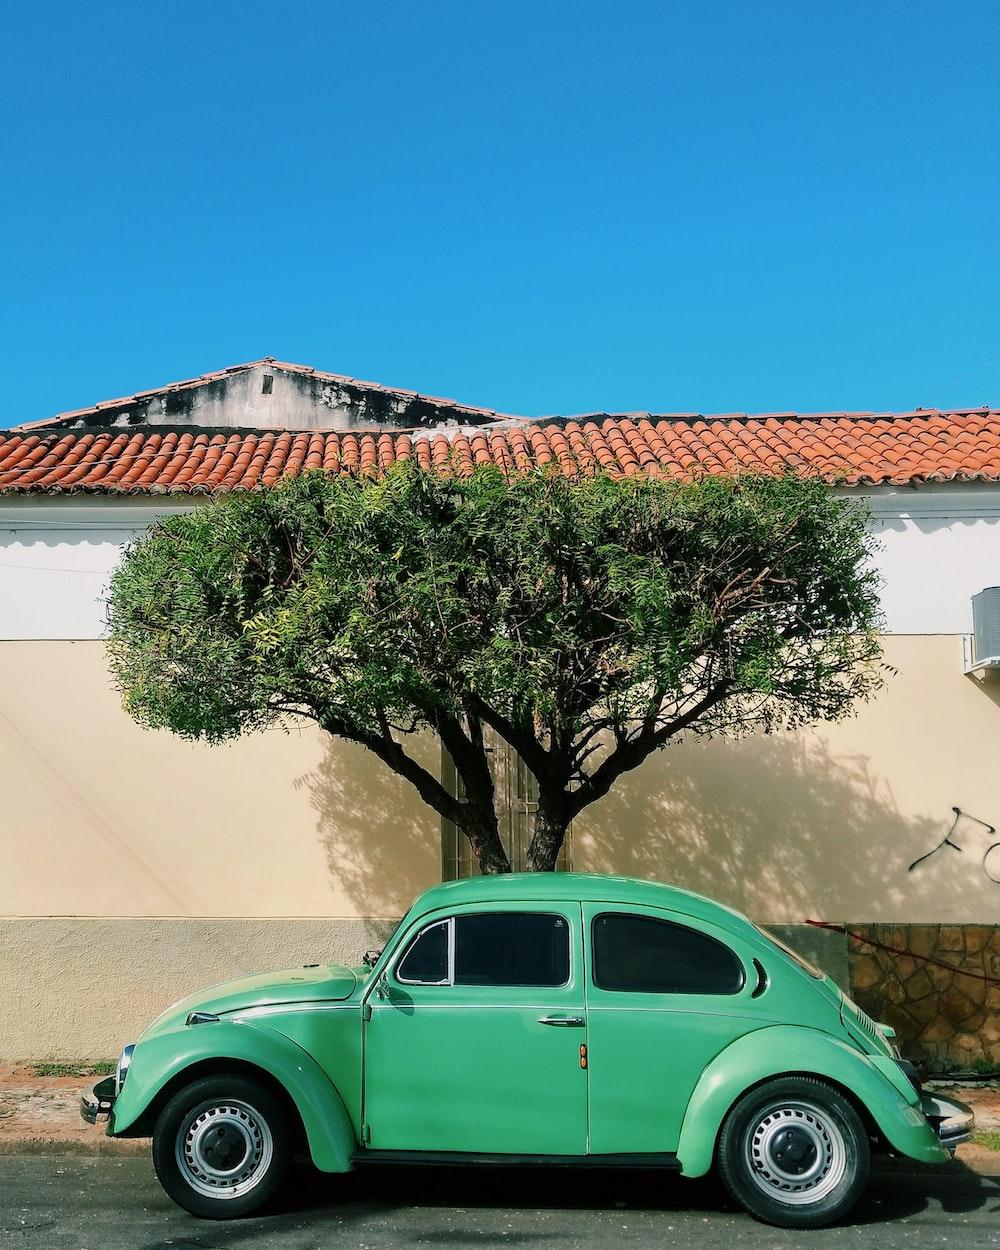 teal Volkswagen beetle car